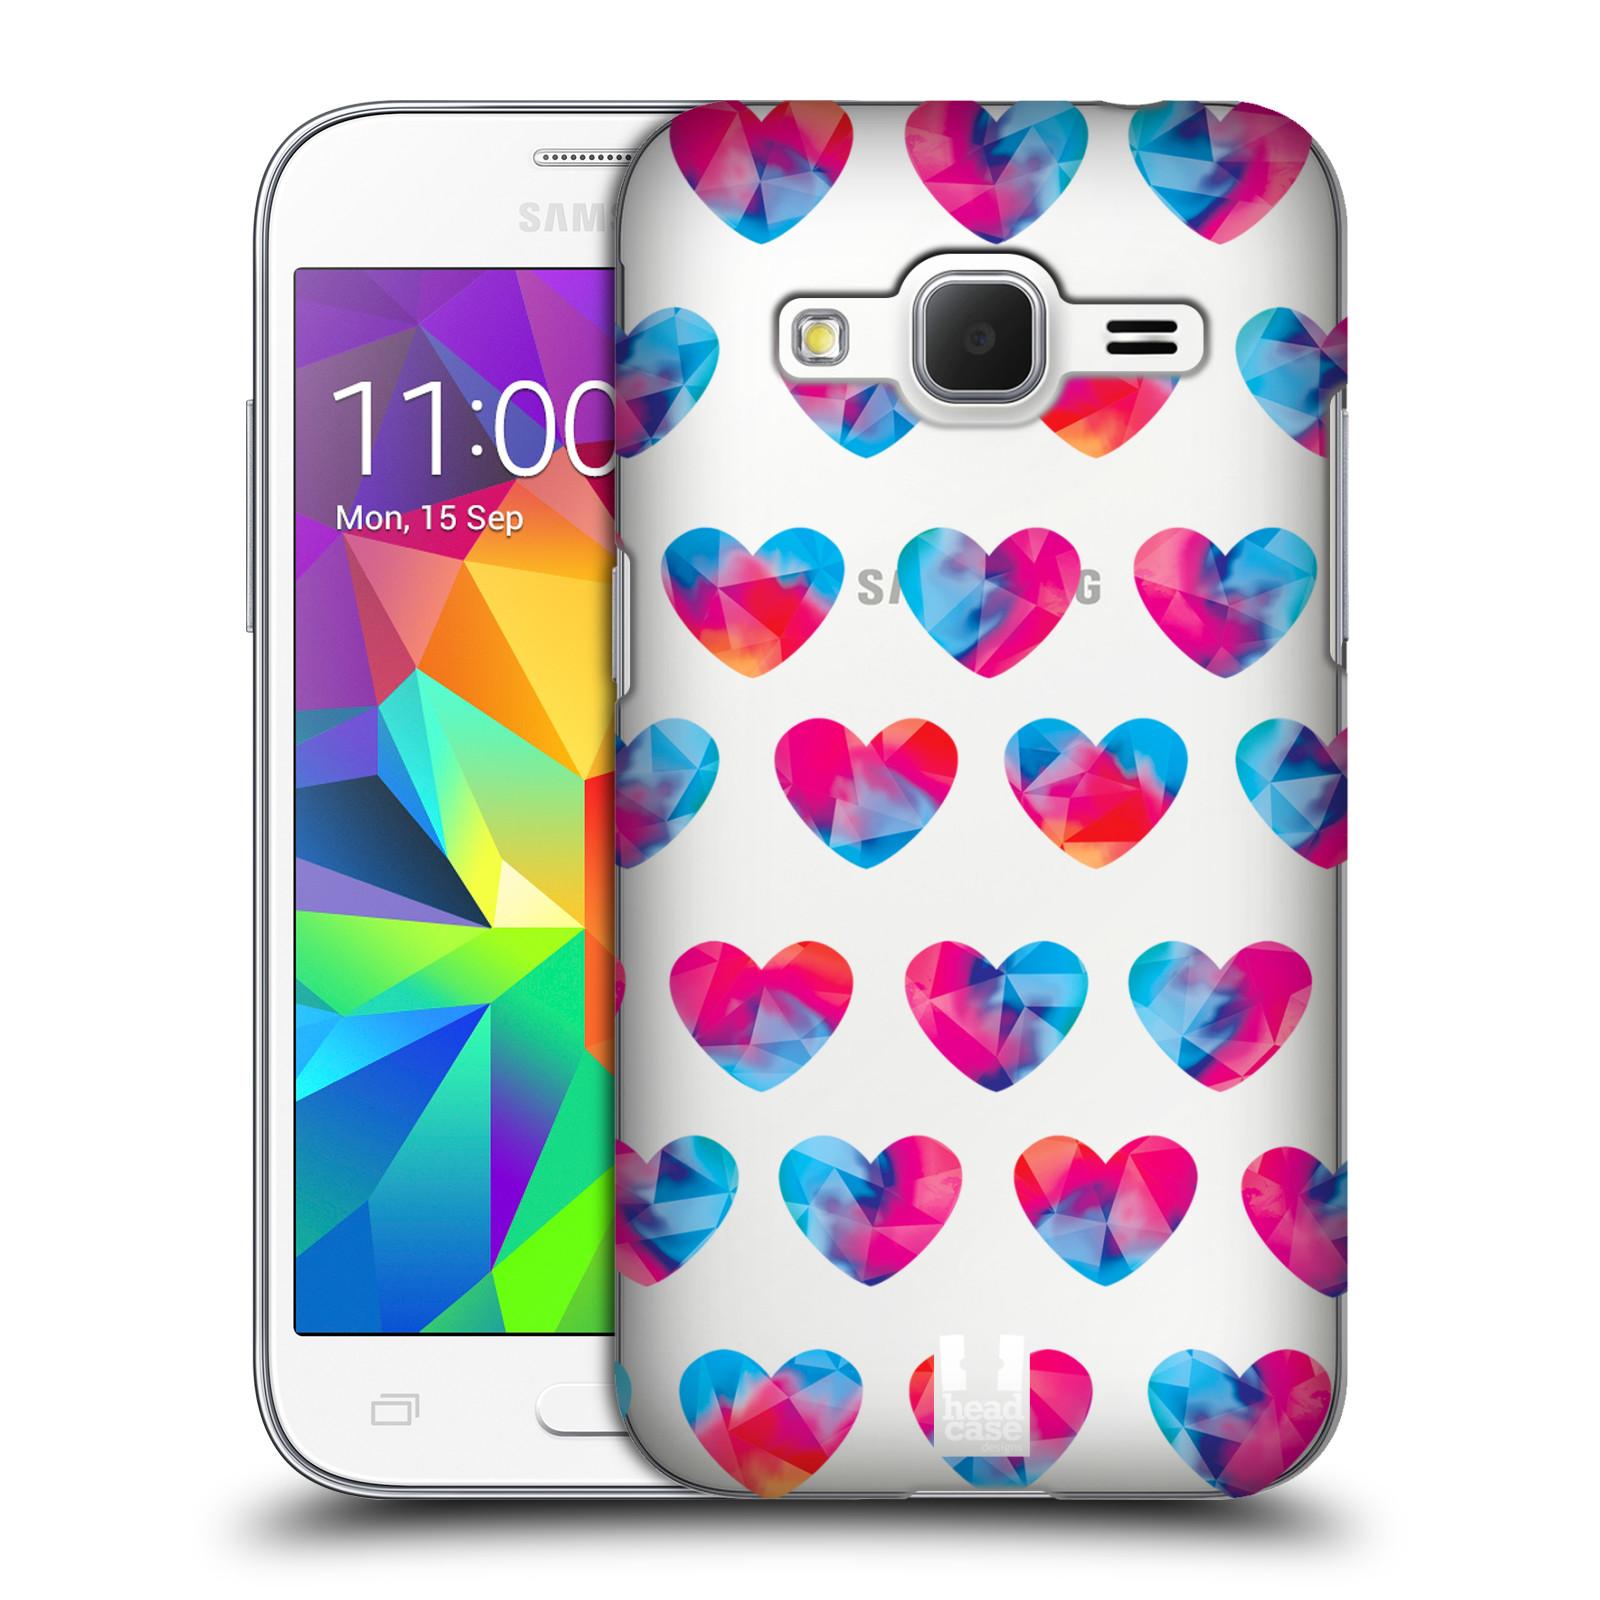 Plastové pouzdro na mobil Samsung Galaxy Core Prime LTE - Head Case - Srdíčka hrající barvami